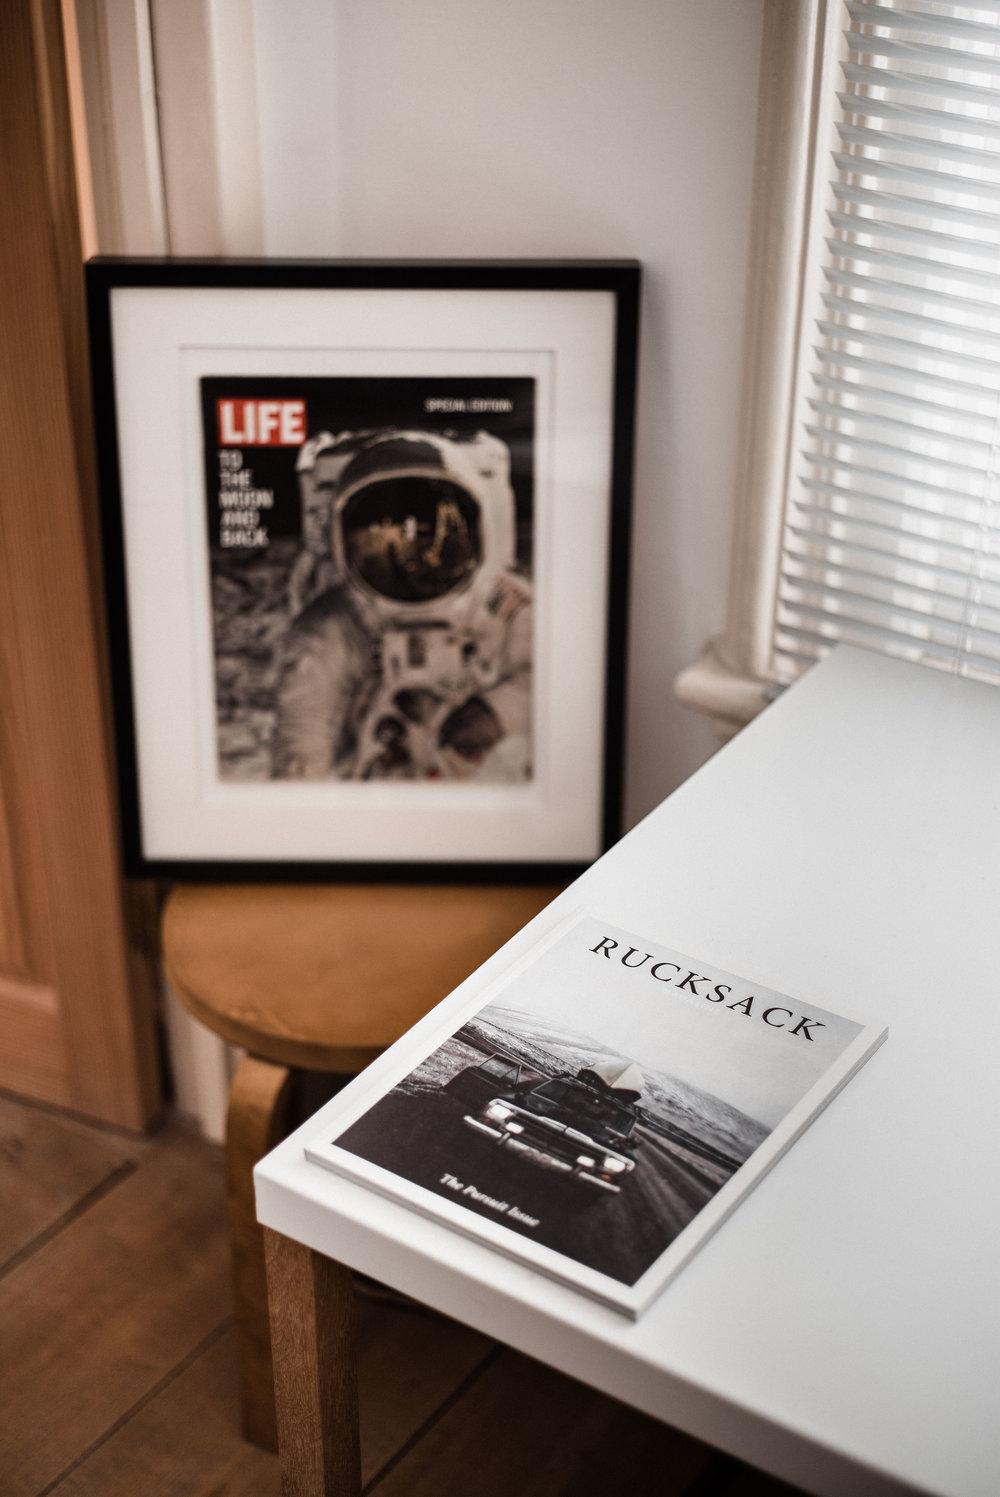 rucksack magazine volume 4 the pursuit issue